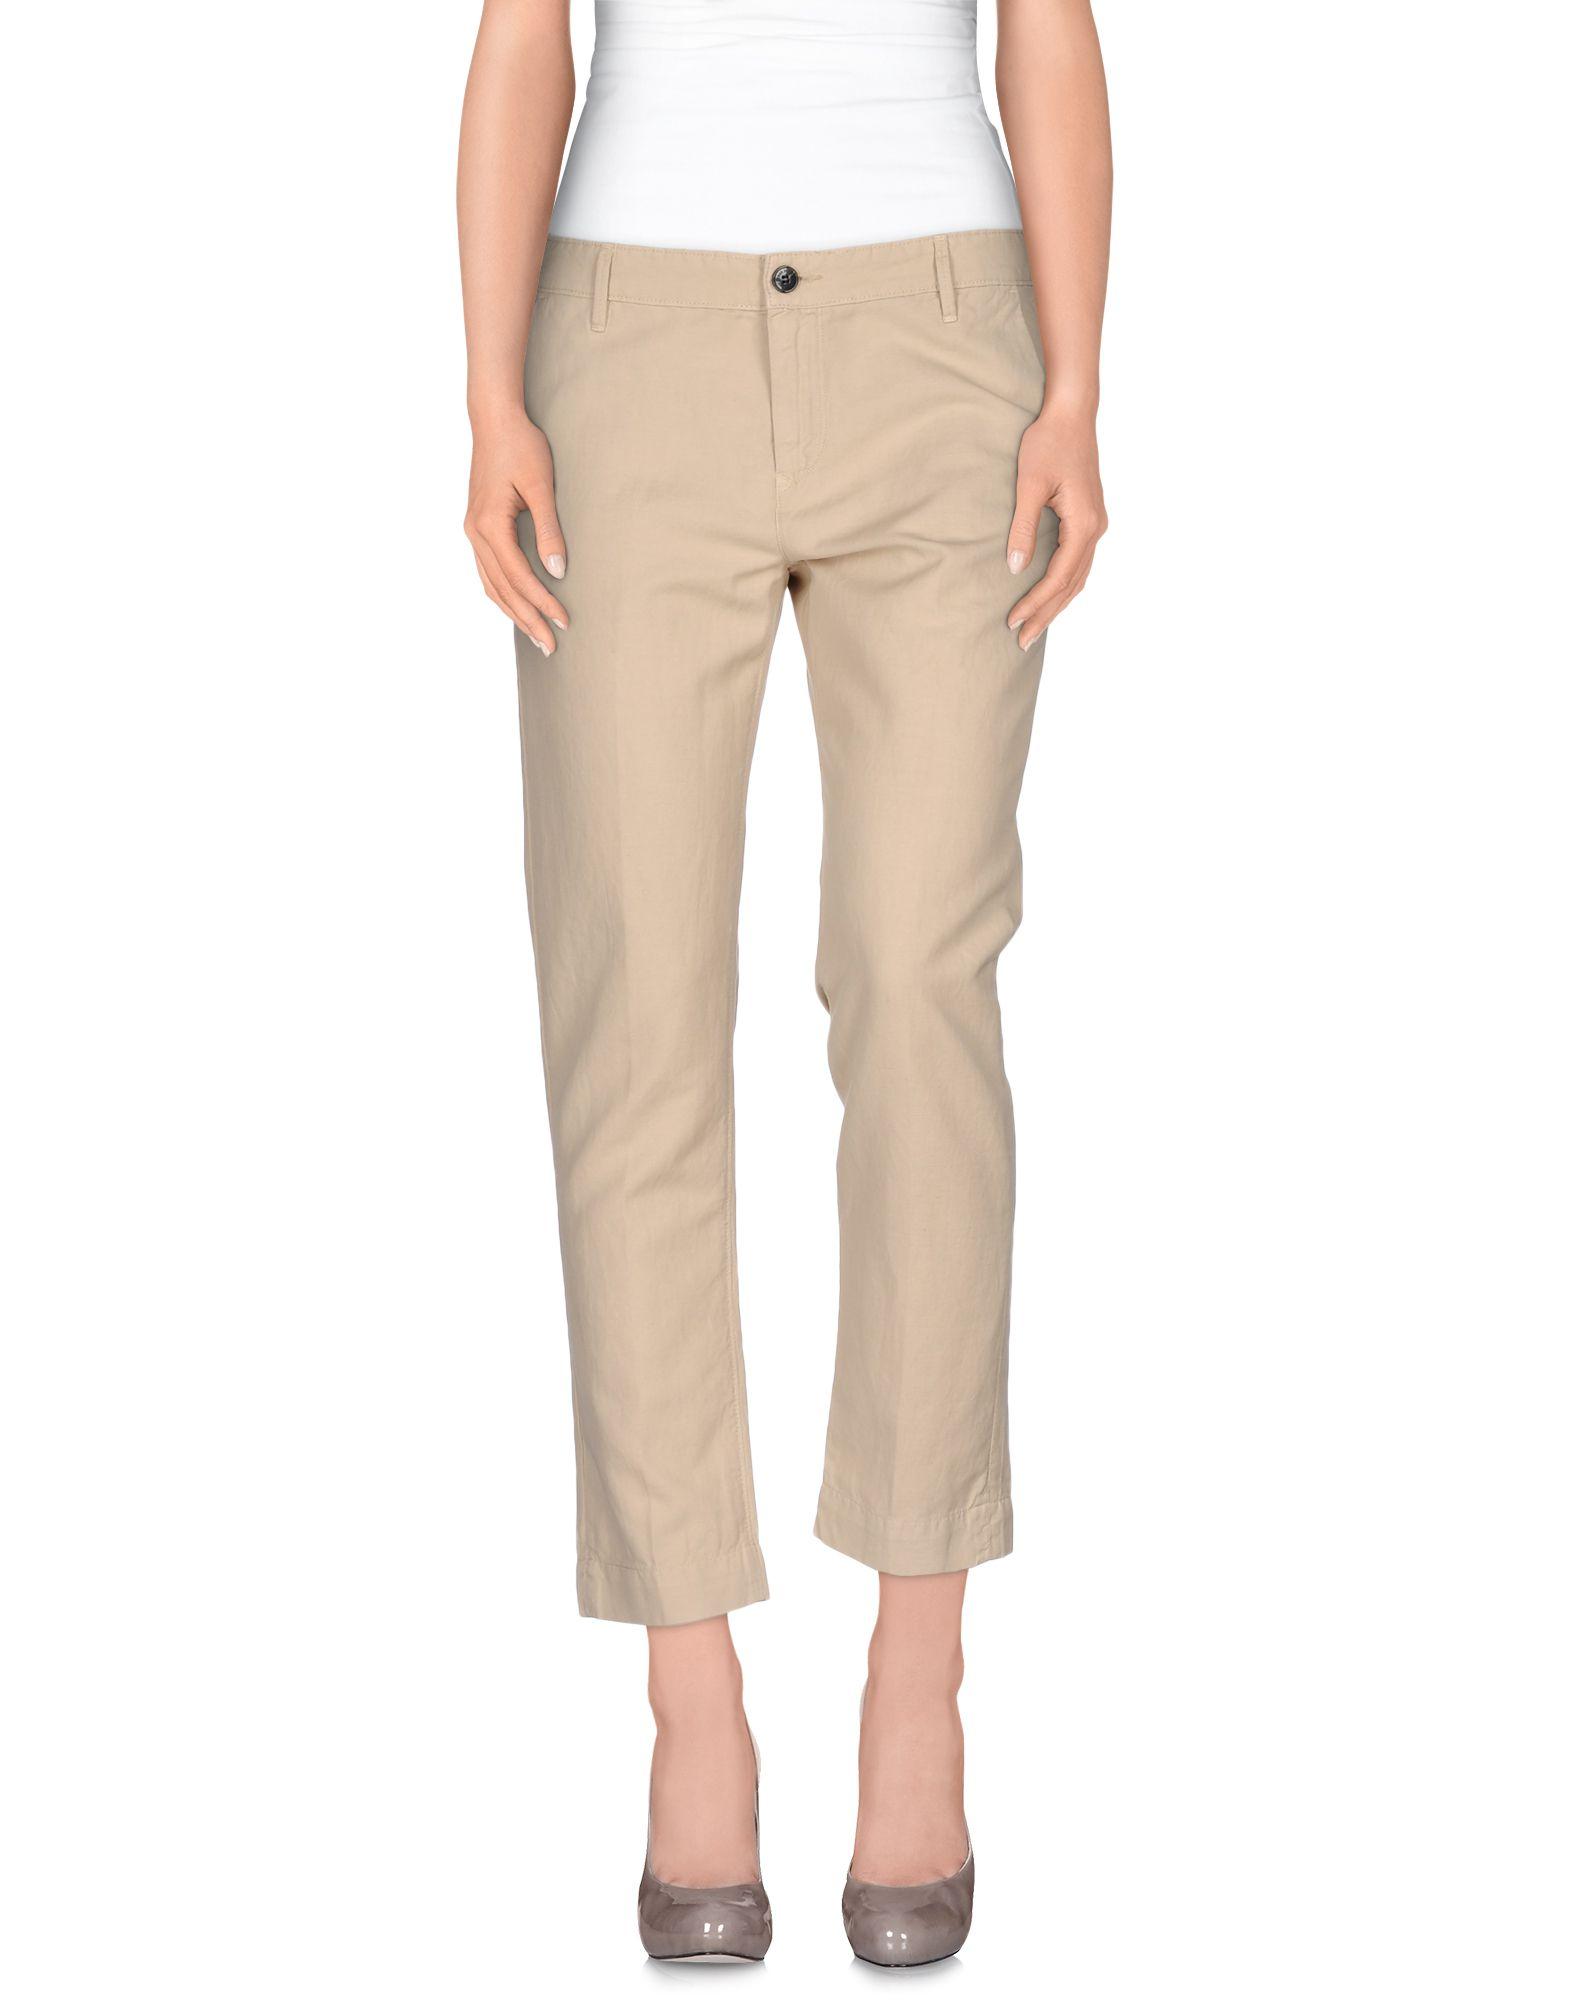 FRED PERRY Damen Hose Farbe Beige Größe 4